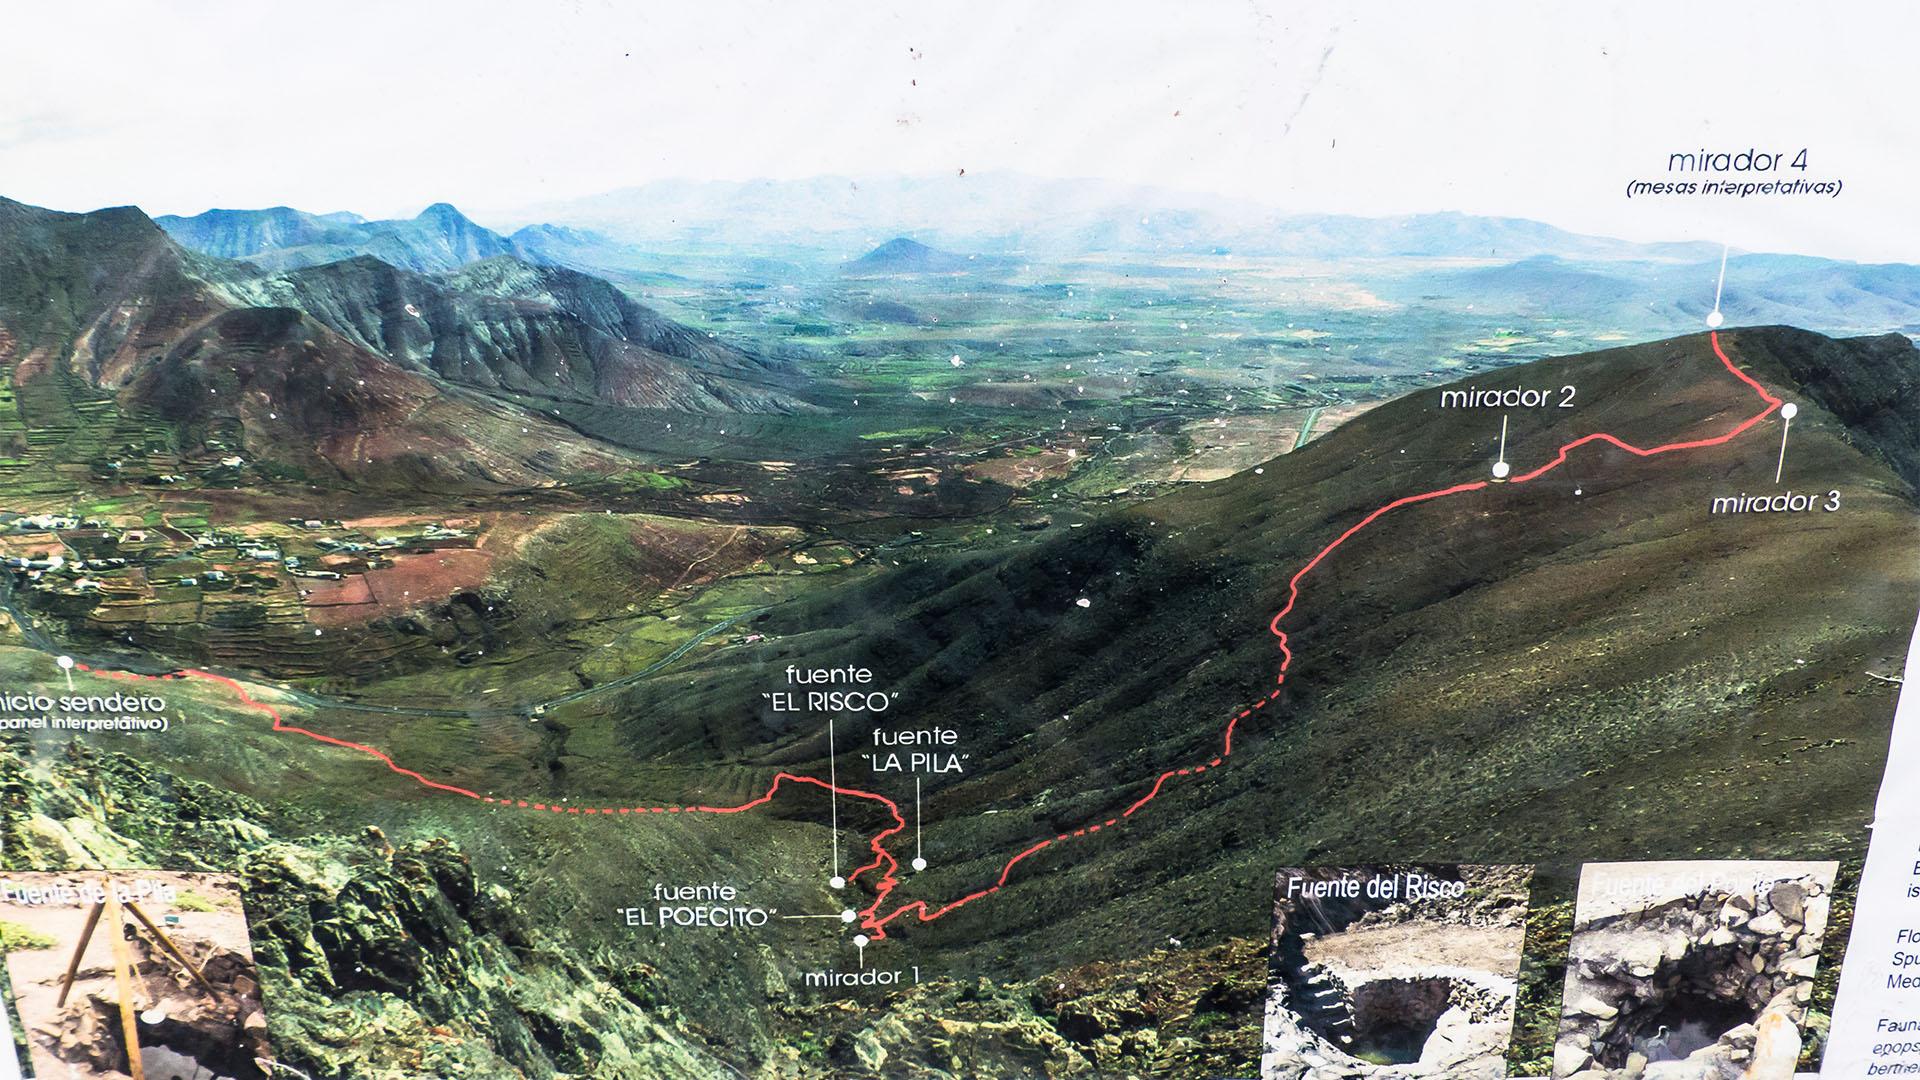 Wegskizze Wanderweg Fuentes de El Chupadero Fuerteventura.